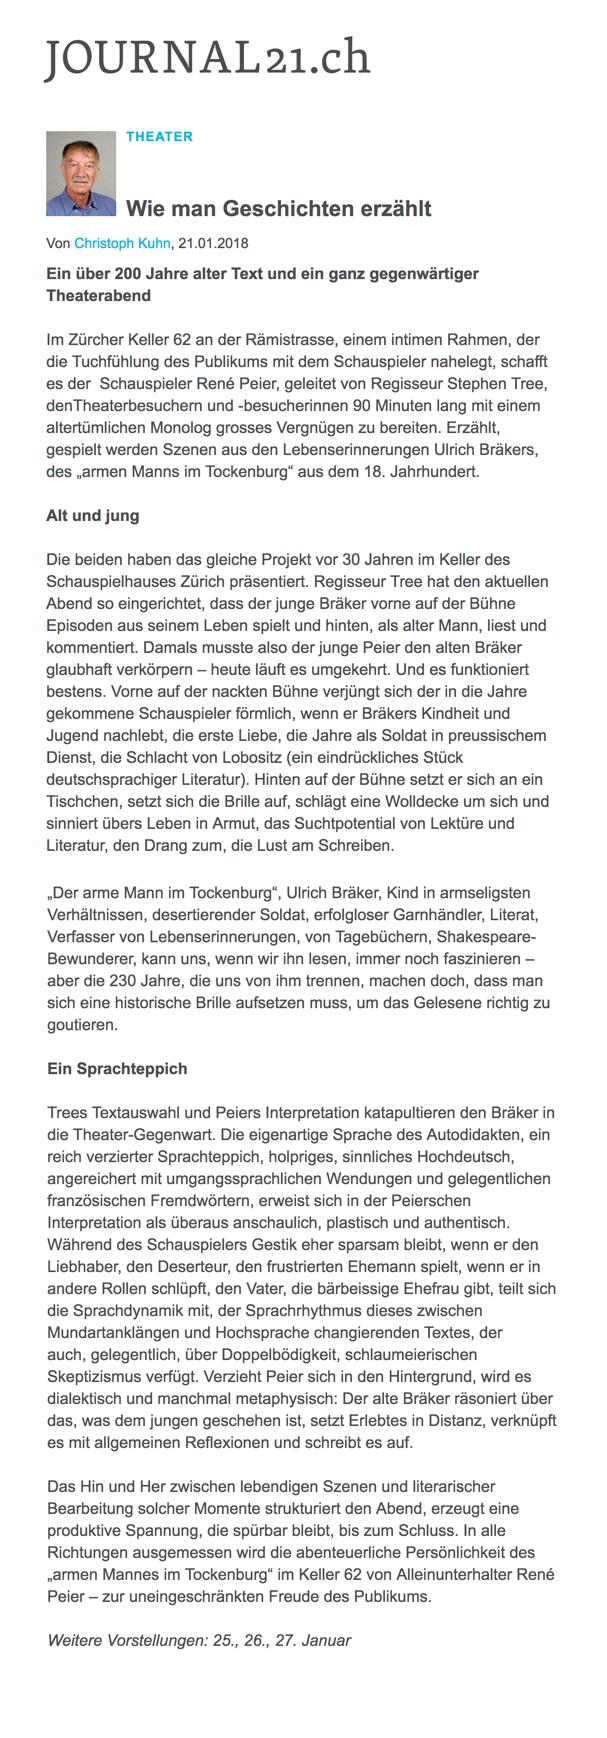 Kritik_J21_René Peier in_Der arme Mann im Tockenburg_Keller62